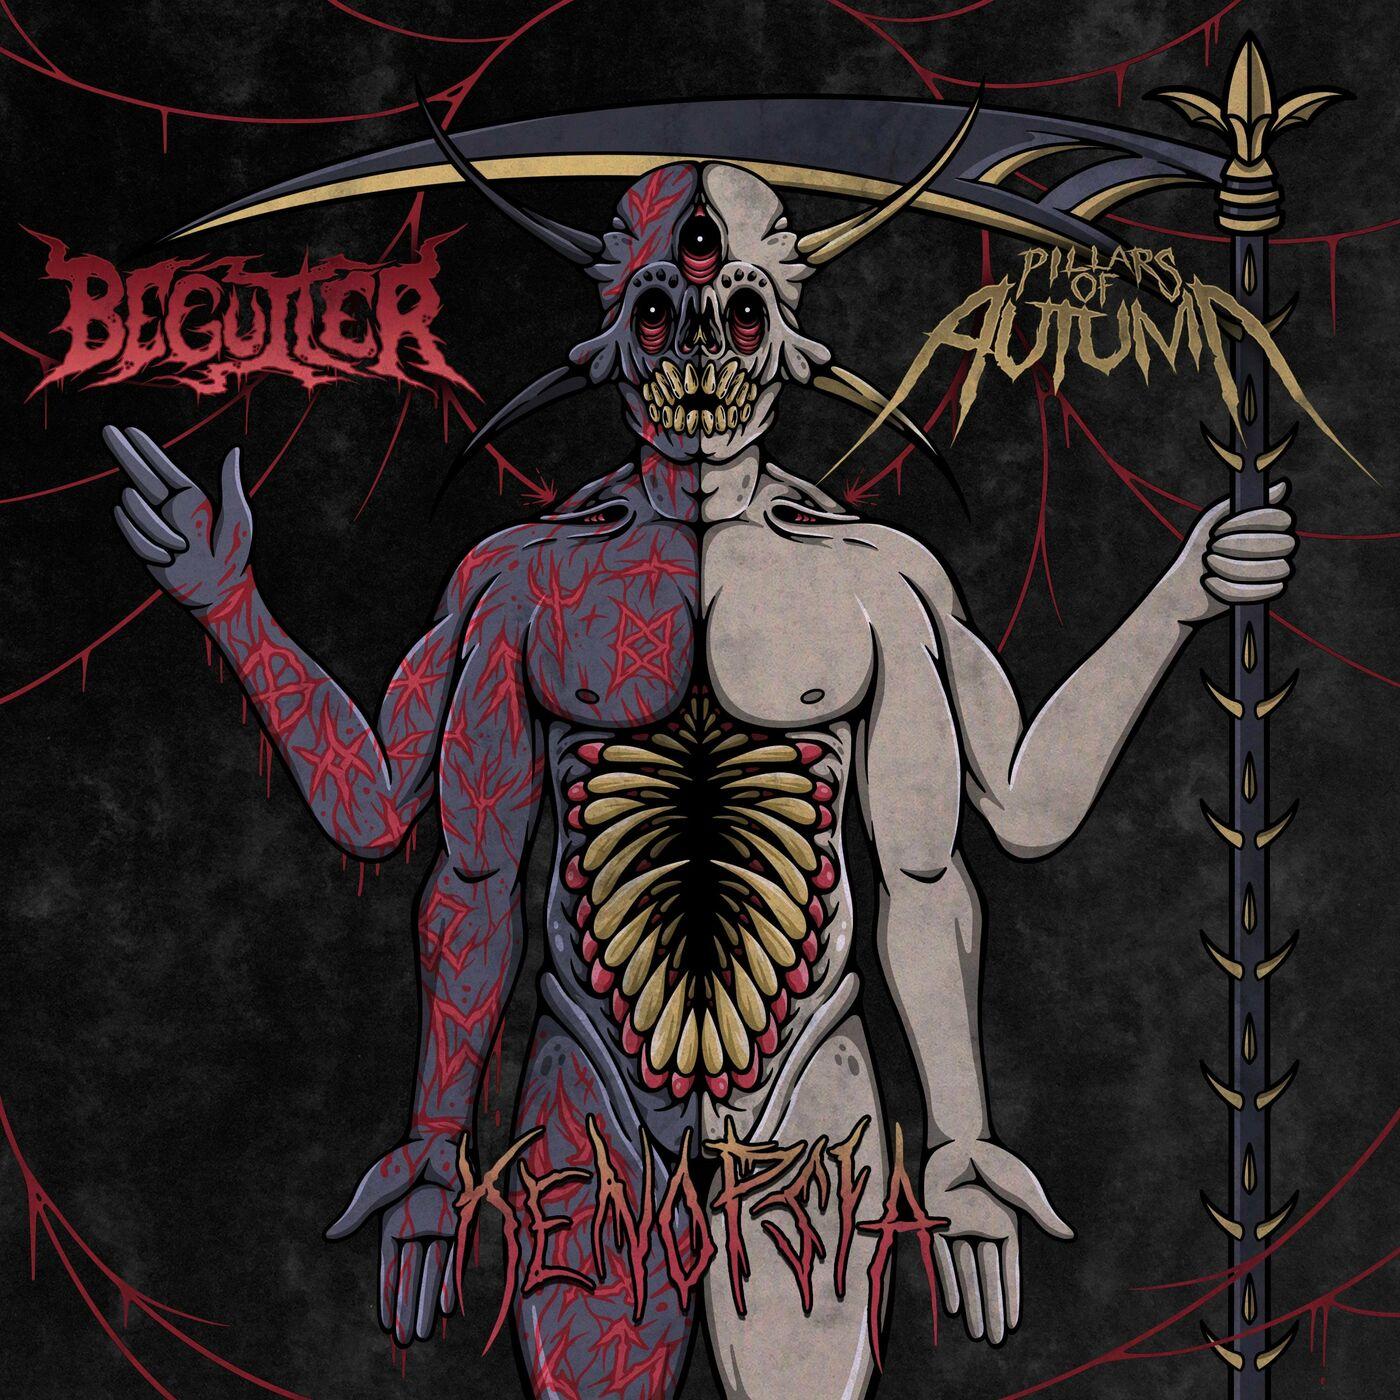 Beguiler / Pillars of Autumn - Kenopsia [split EP] (2020)